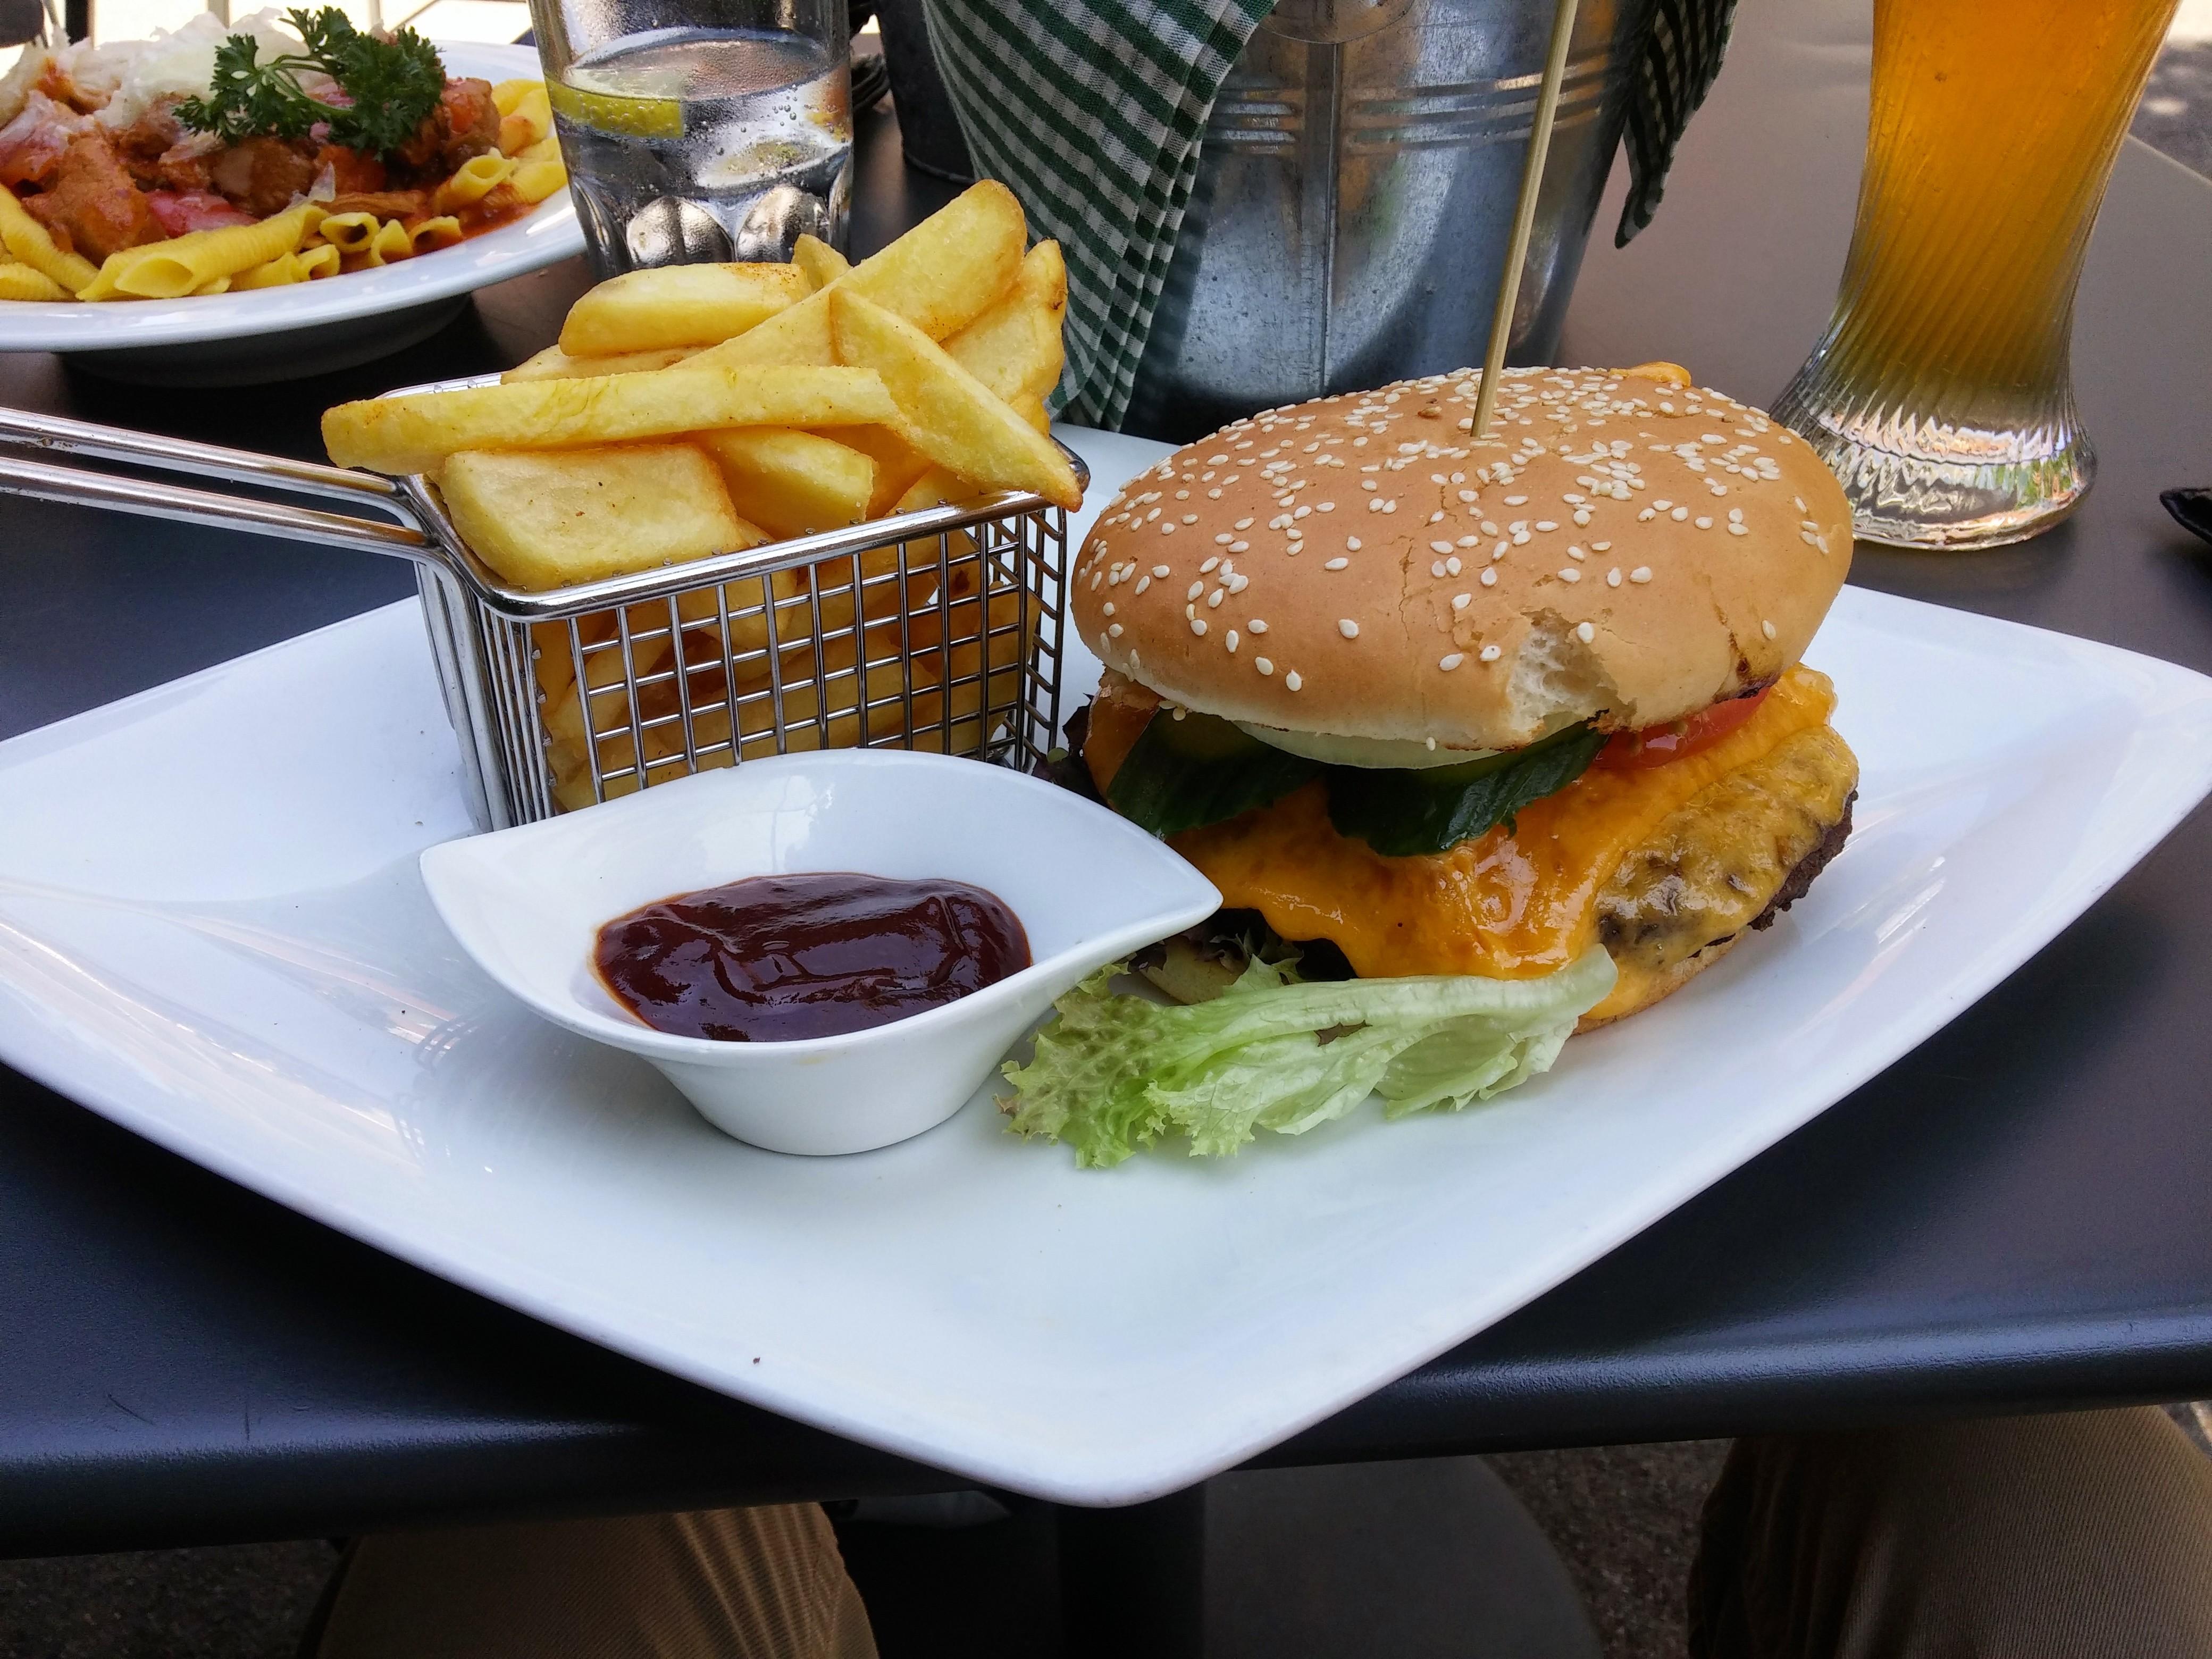 https://foodloader.net/nico_2015-06-12_cheeseburger-mit-pommes-frites.jpg